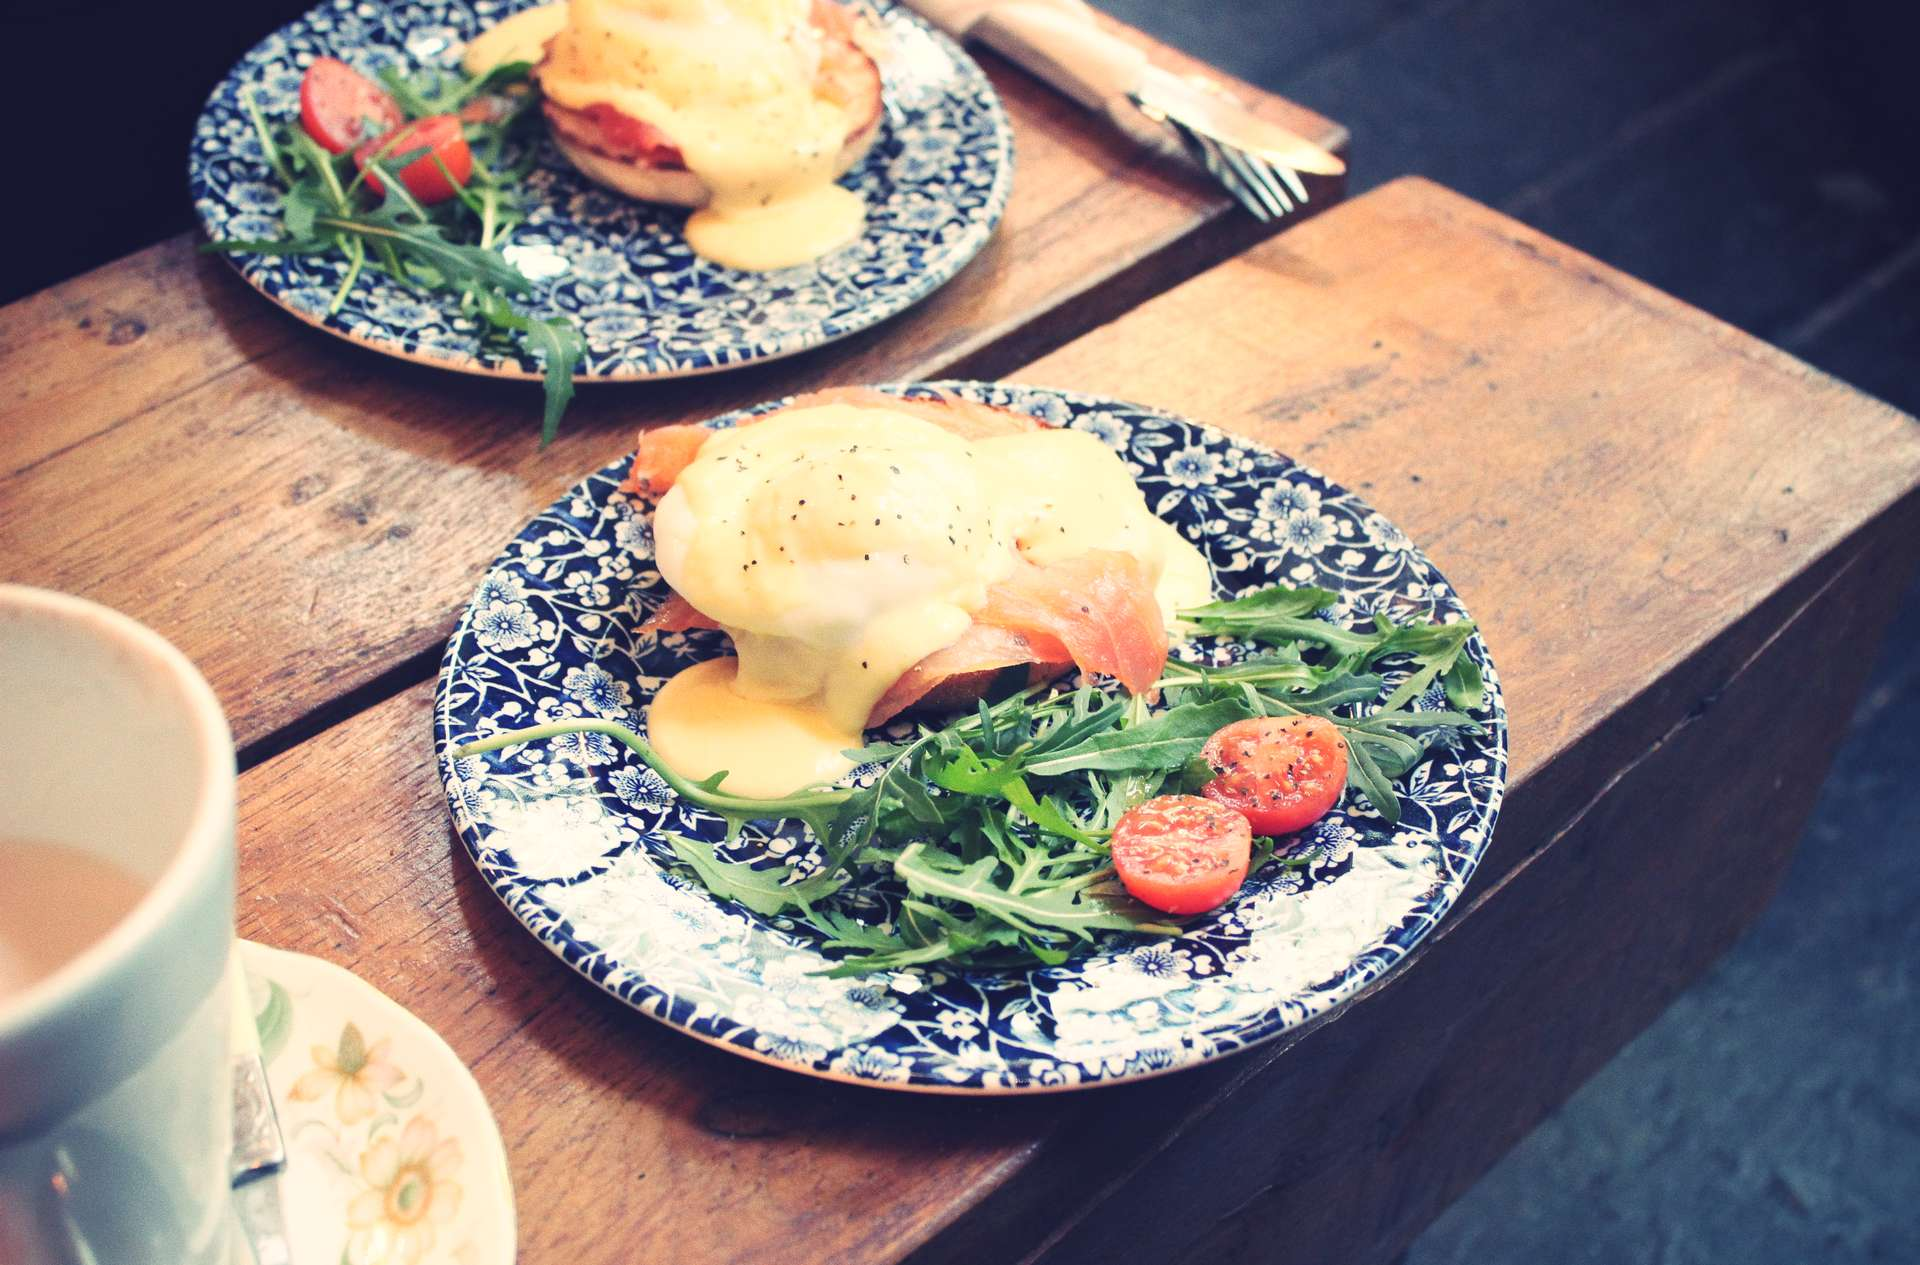 cardiff-erope-trip-breakfast-bblogger-lifestyle-nunaavane-ctbb6